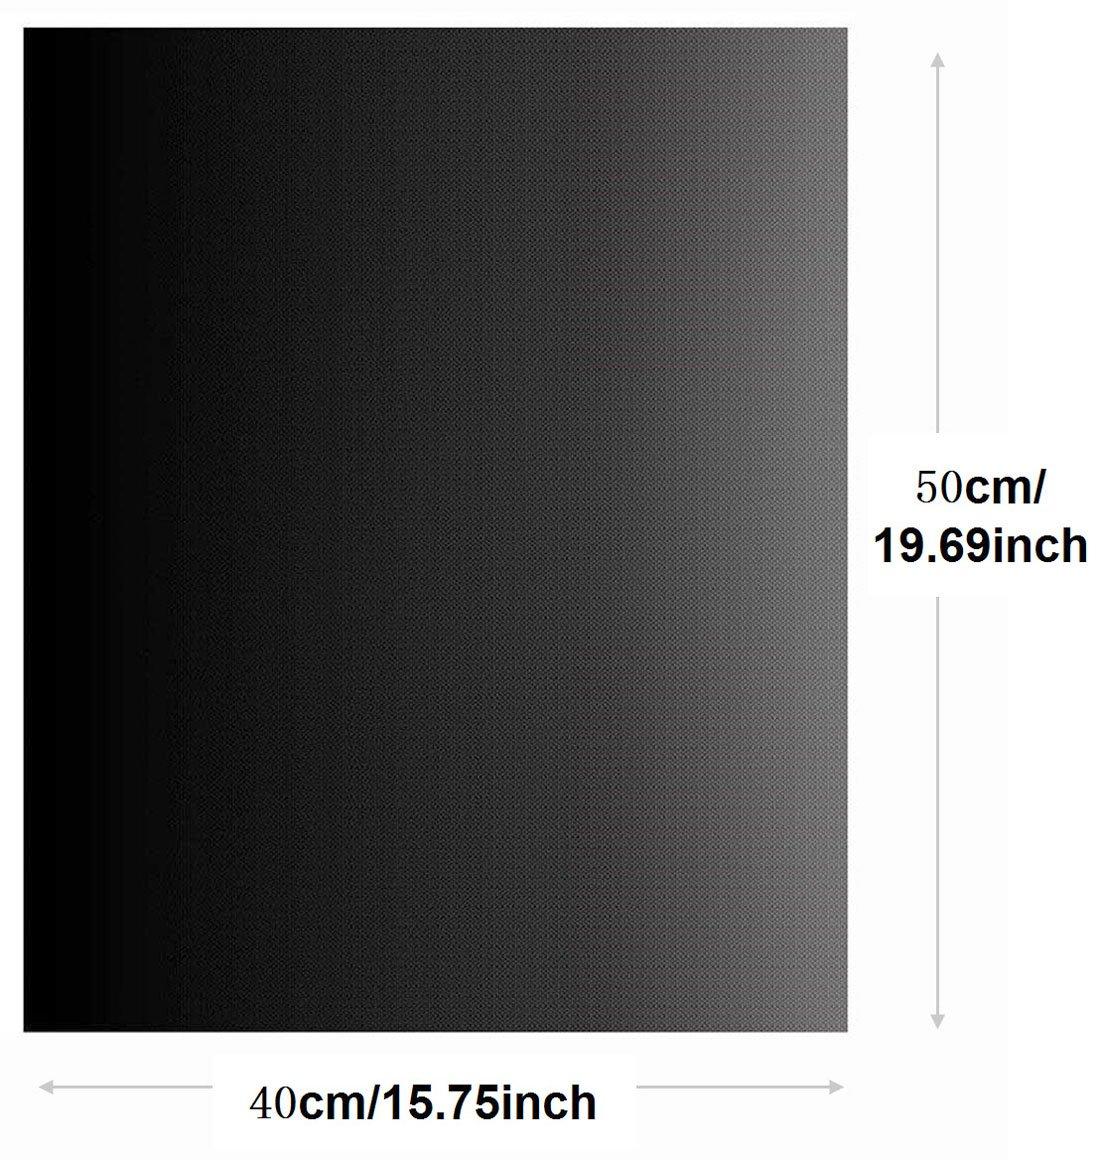 ... gas eléctrico microondas ventilador horno tostadoras - 40 x 50 cm/15,75 x 19,69 pulgadas - se puede utilizar como alfombrilla de horno para barbacoa ...